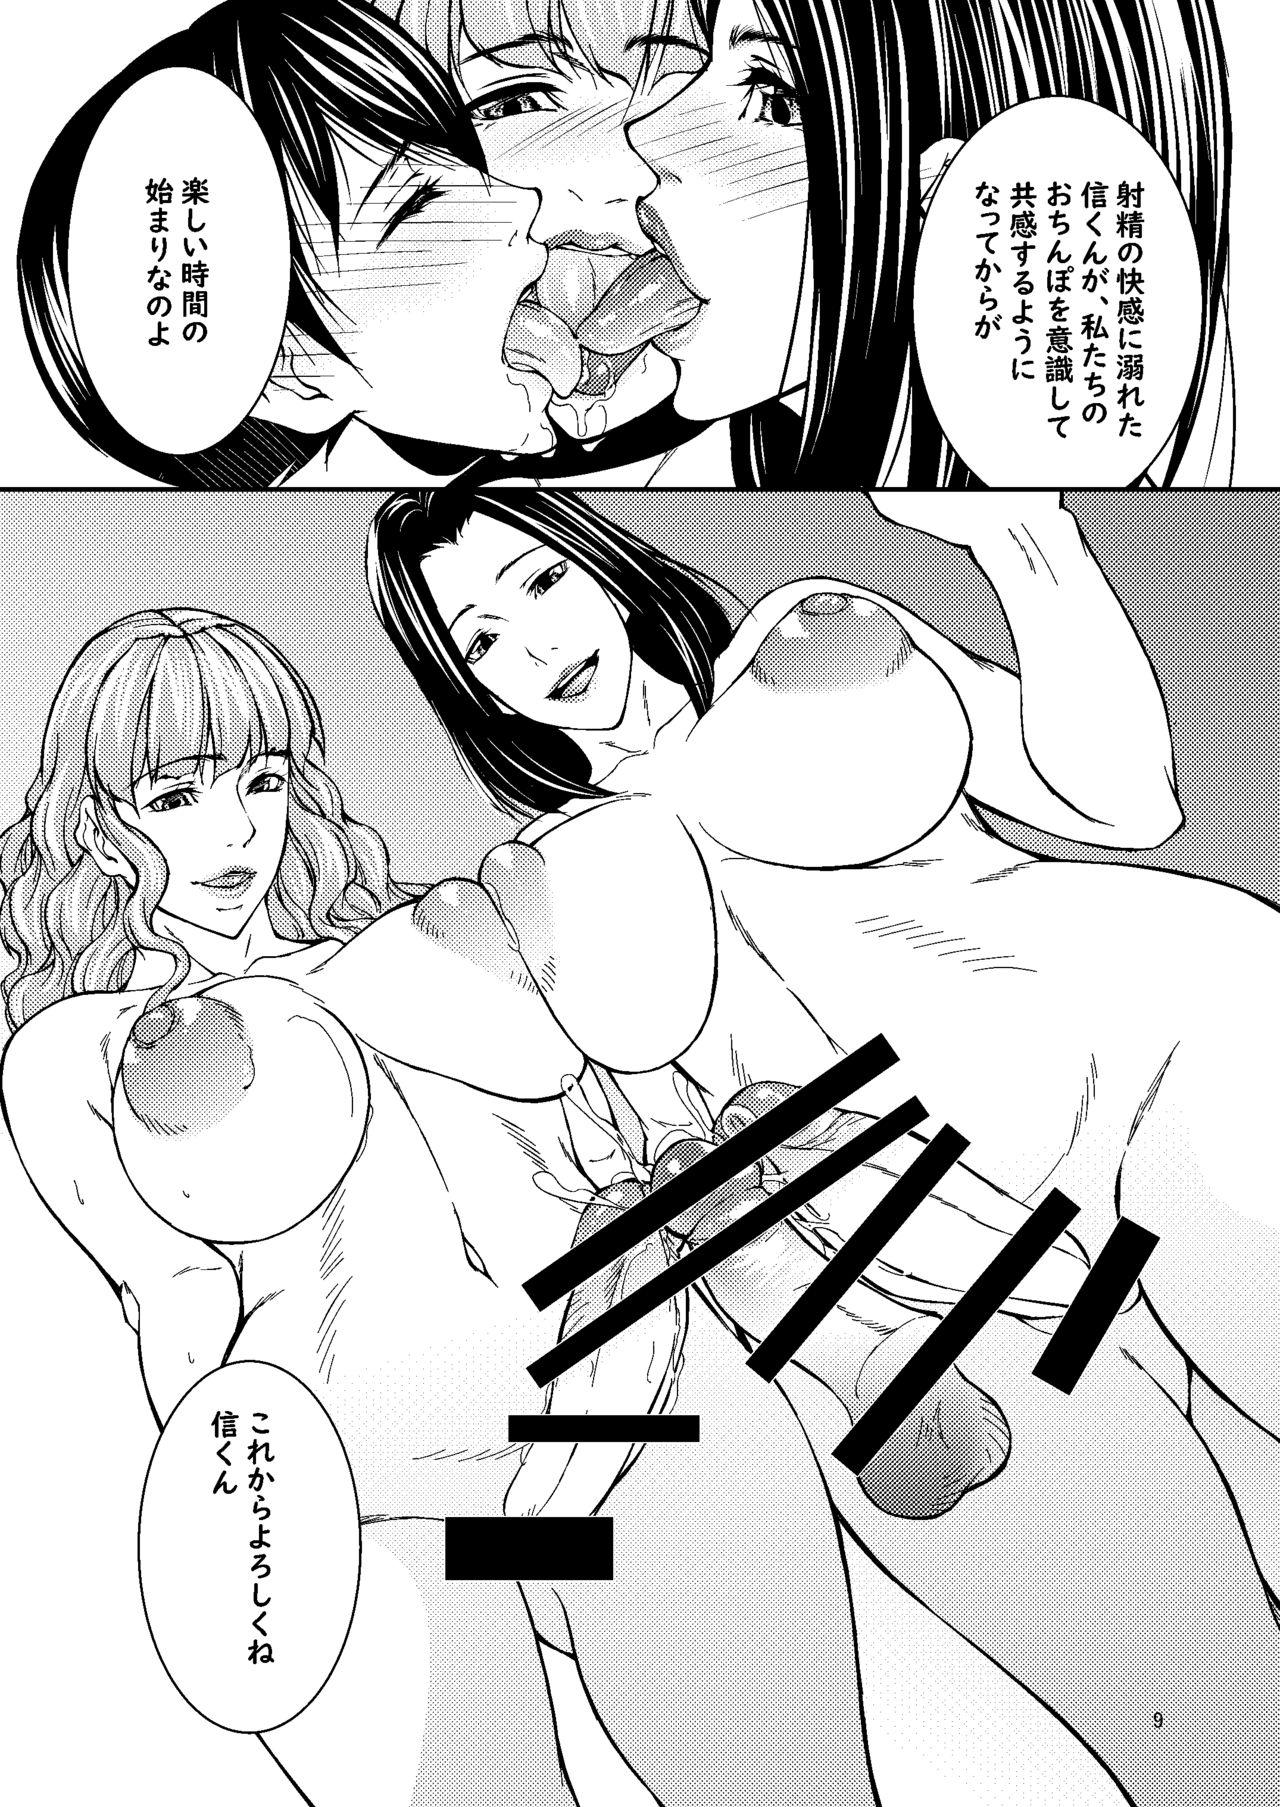 Itoko wa Machikirenai 6